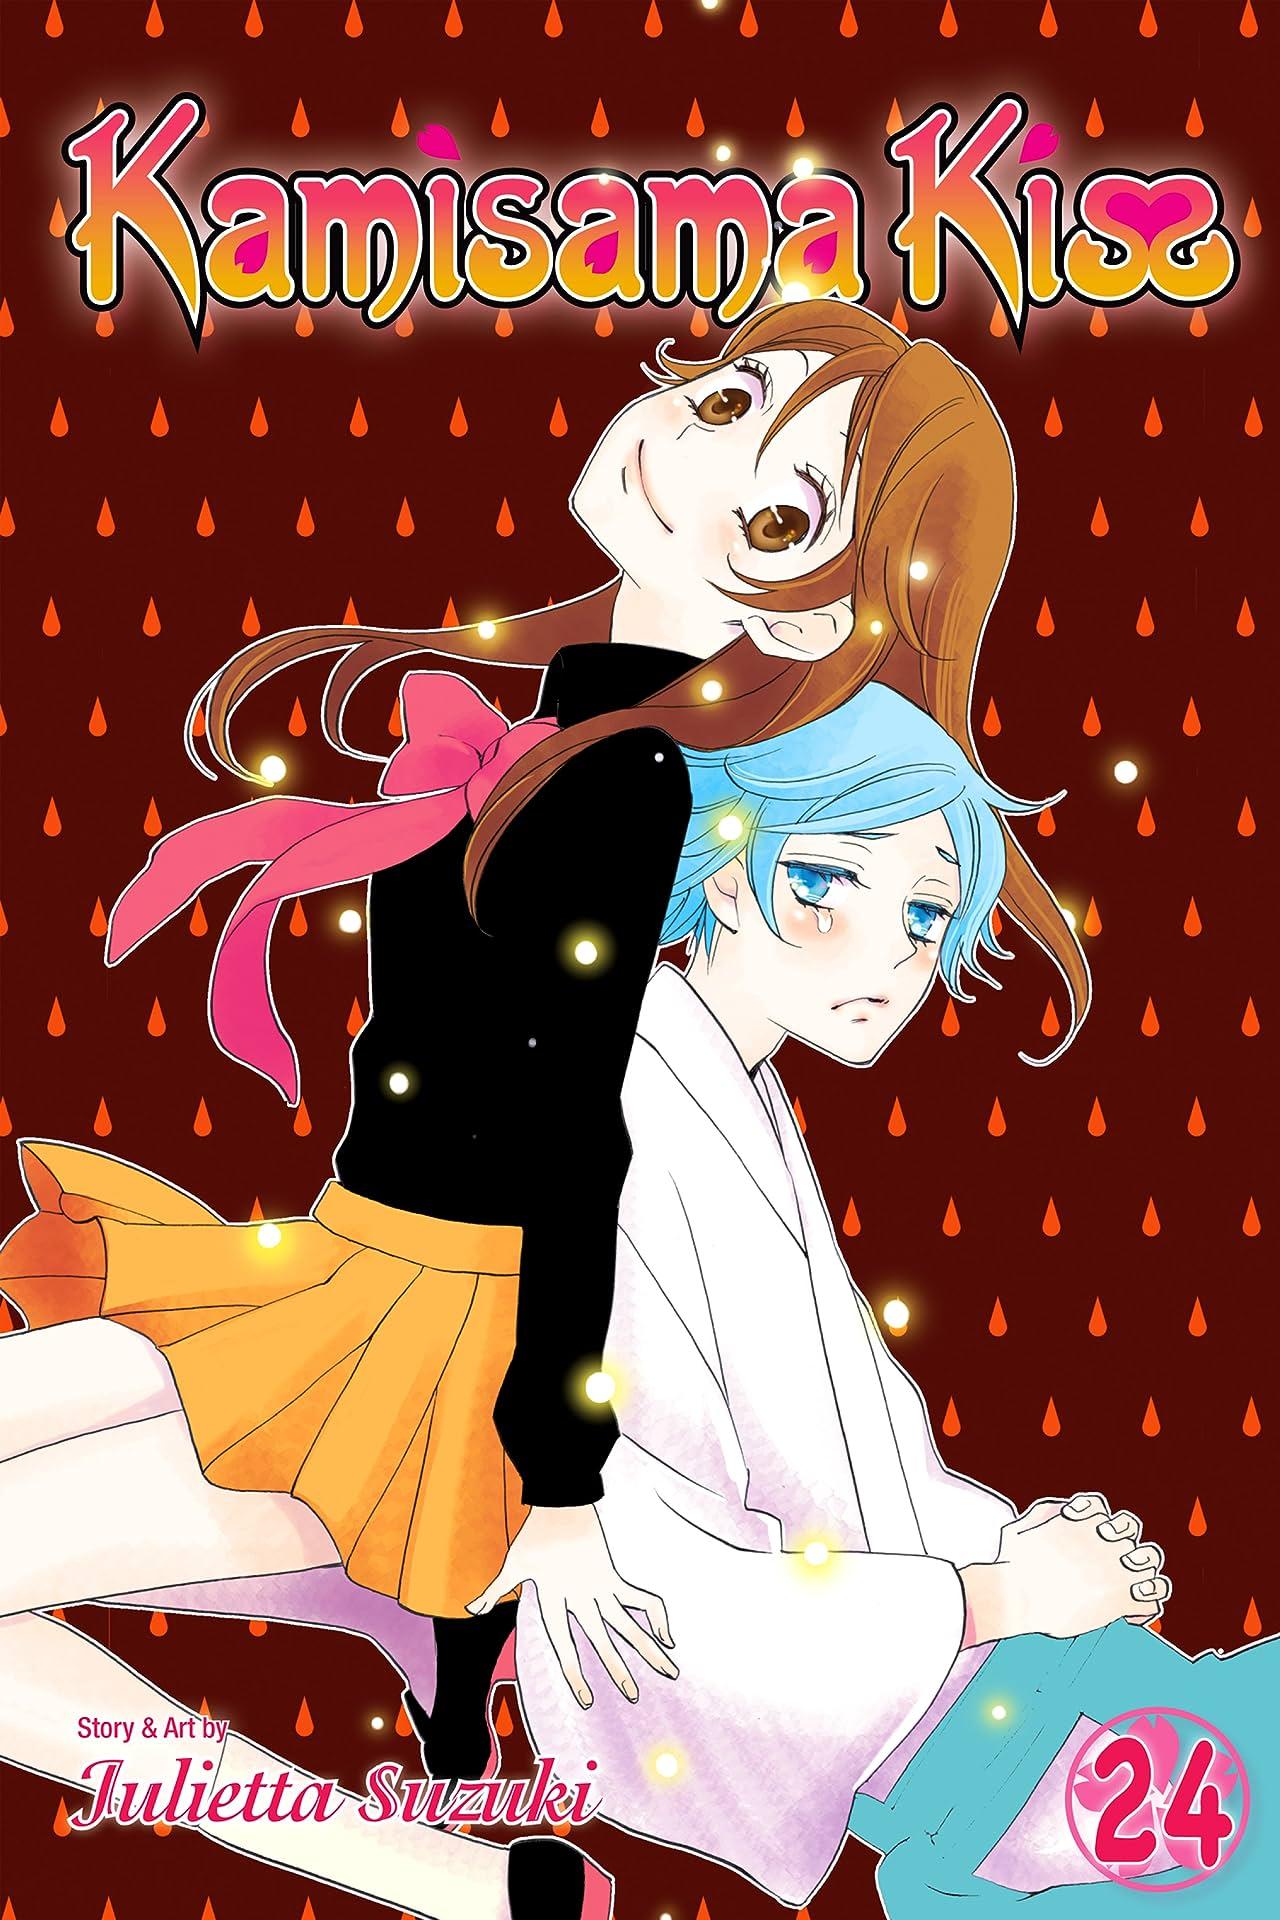 Kamisama Kiss Vol. 24